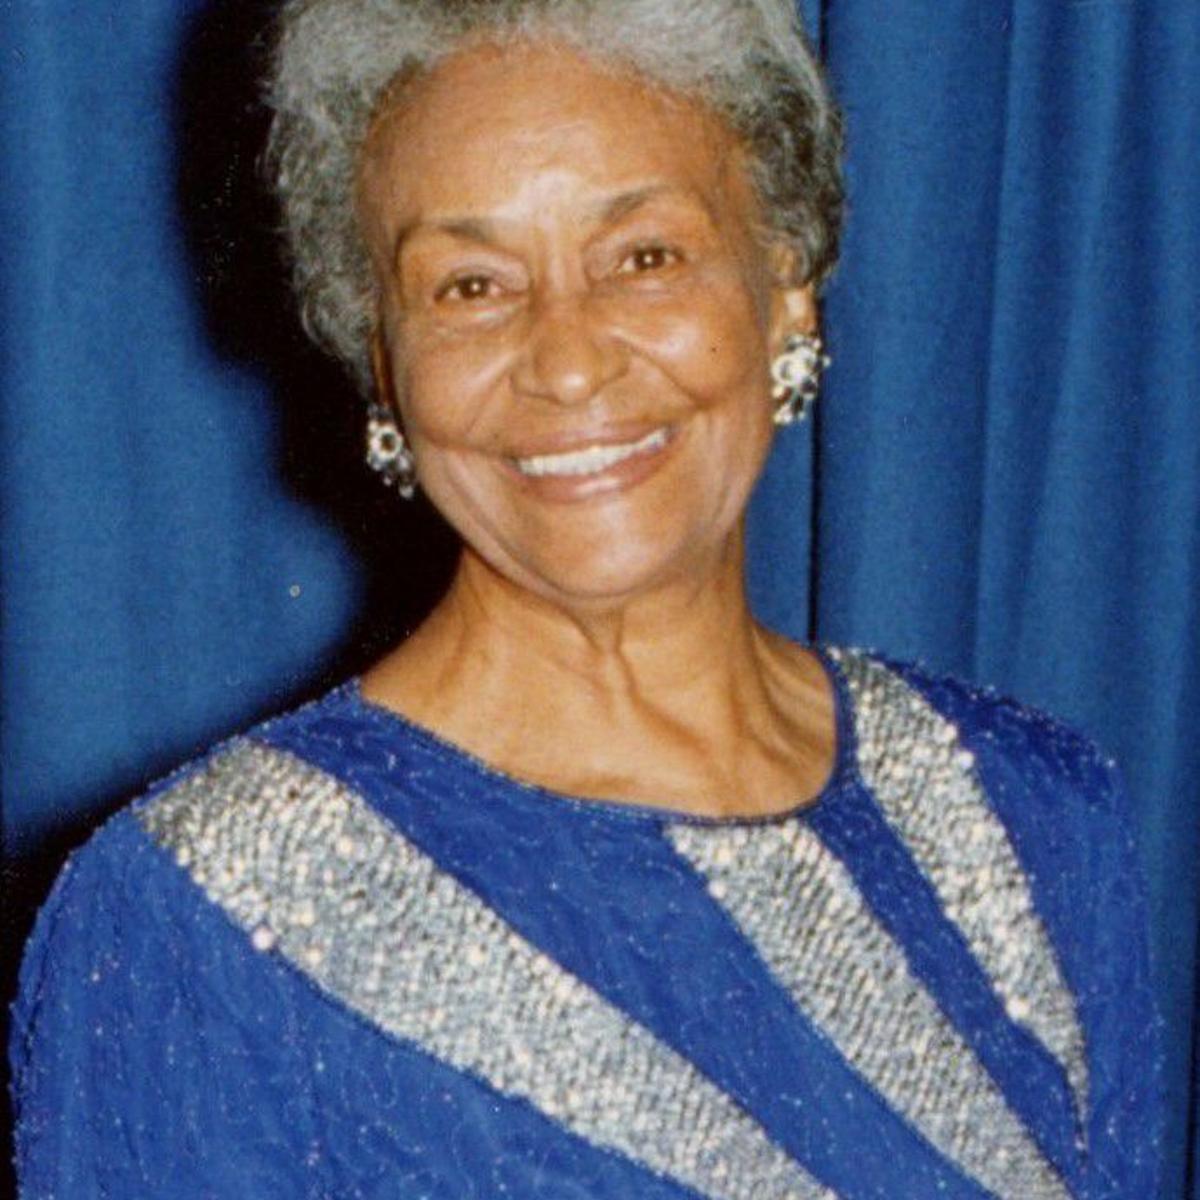 BOYER, Arlene Ann Waller | Obituaries | roanoke com